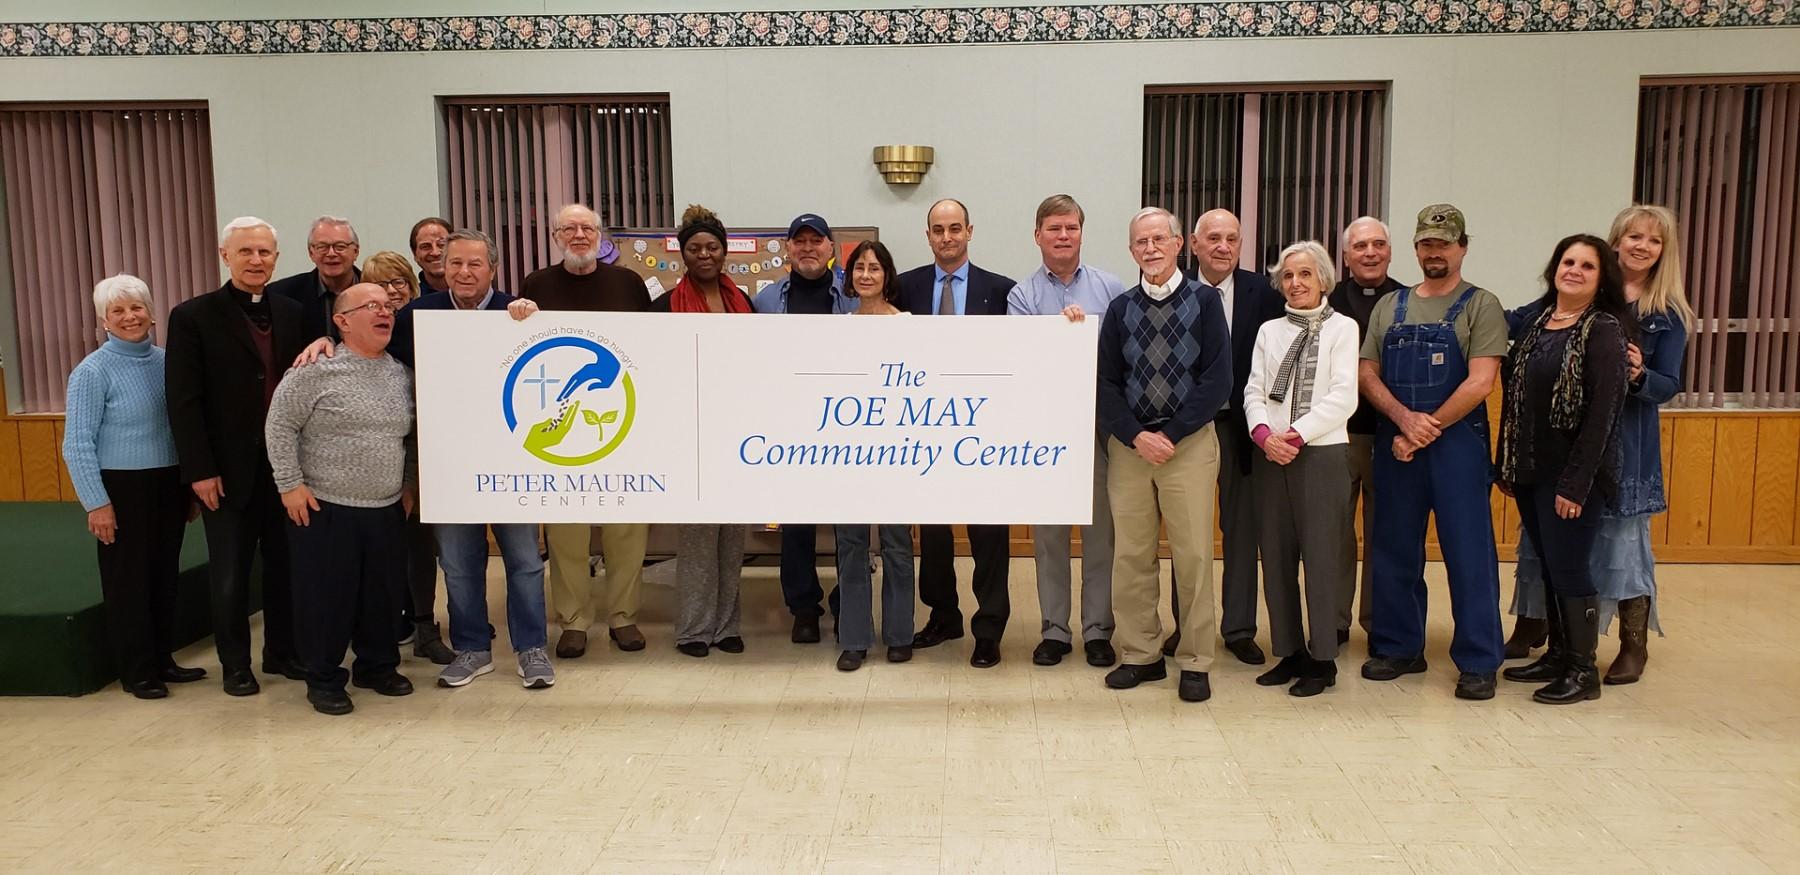 Peter Maurin Center Community Center